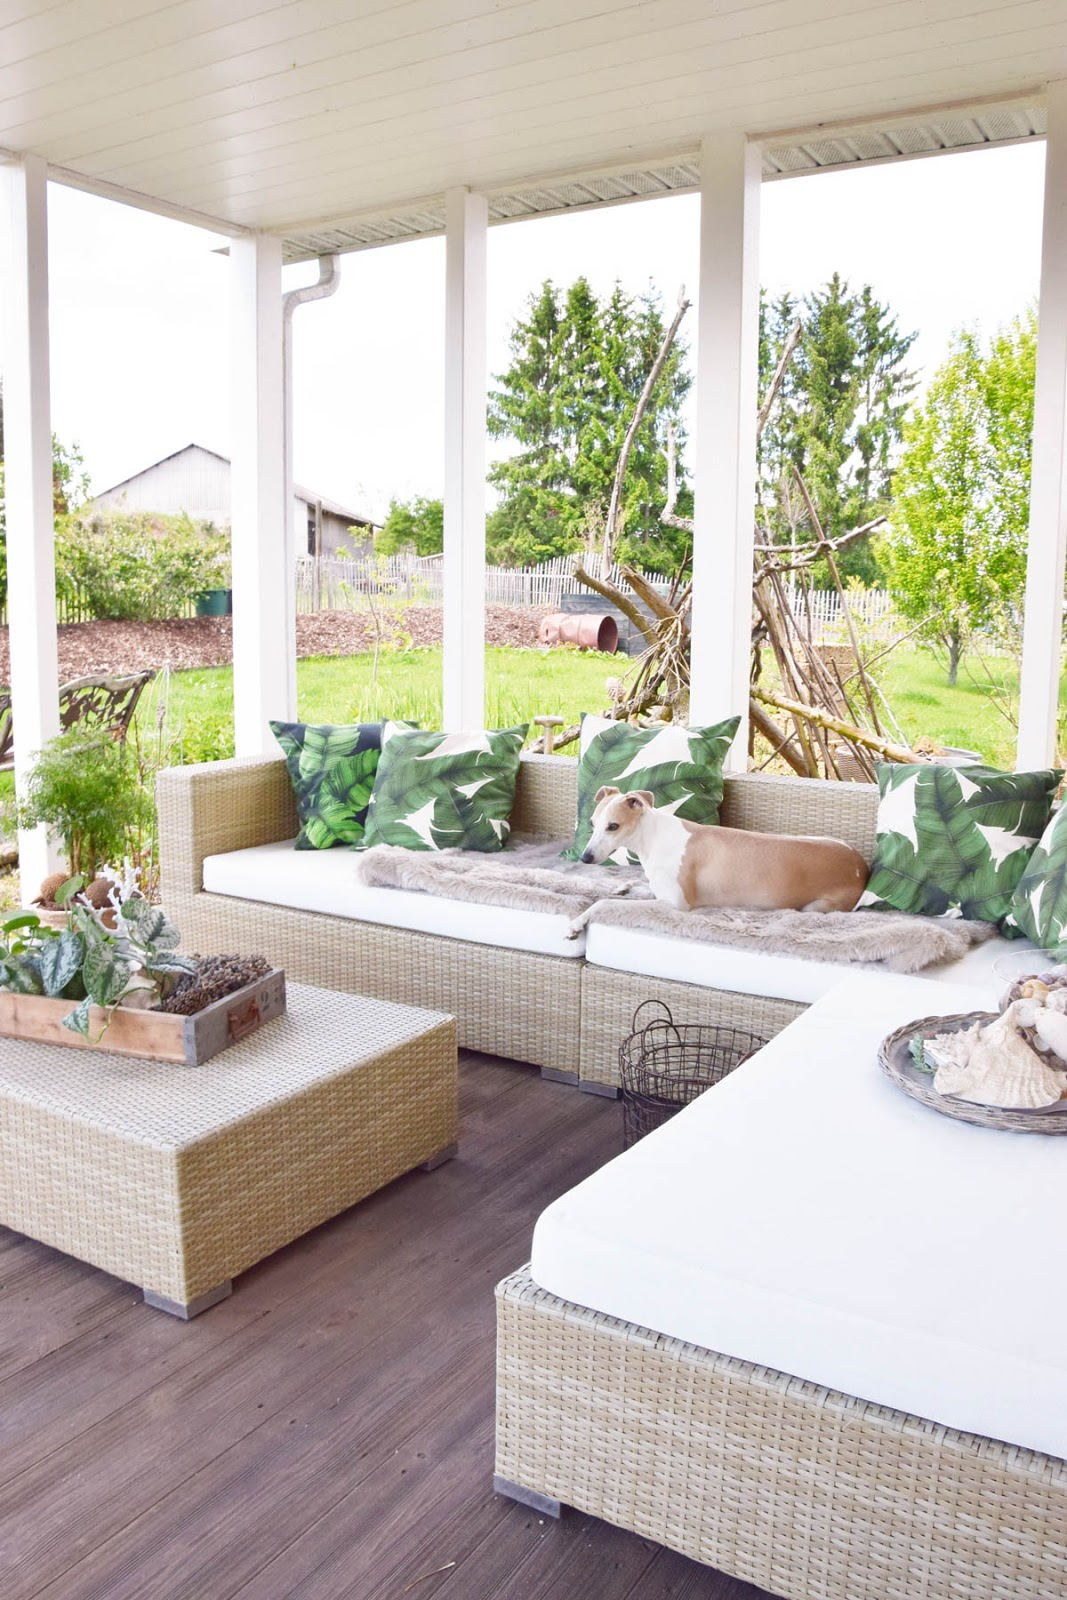 hallo veranda mein sommer refugium und tropical deko tipps f r euch eclectic hamilton. Black Bedroom Furniture Sets. Home Design Ideas